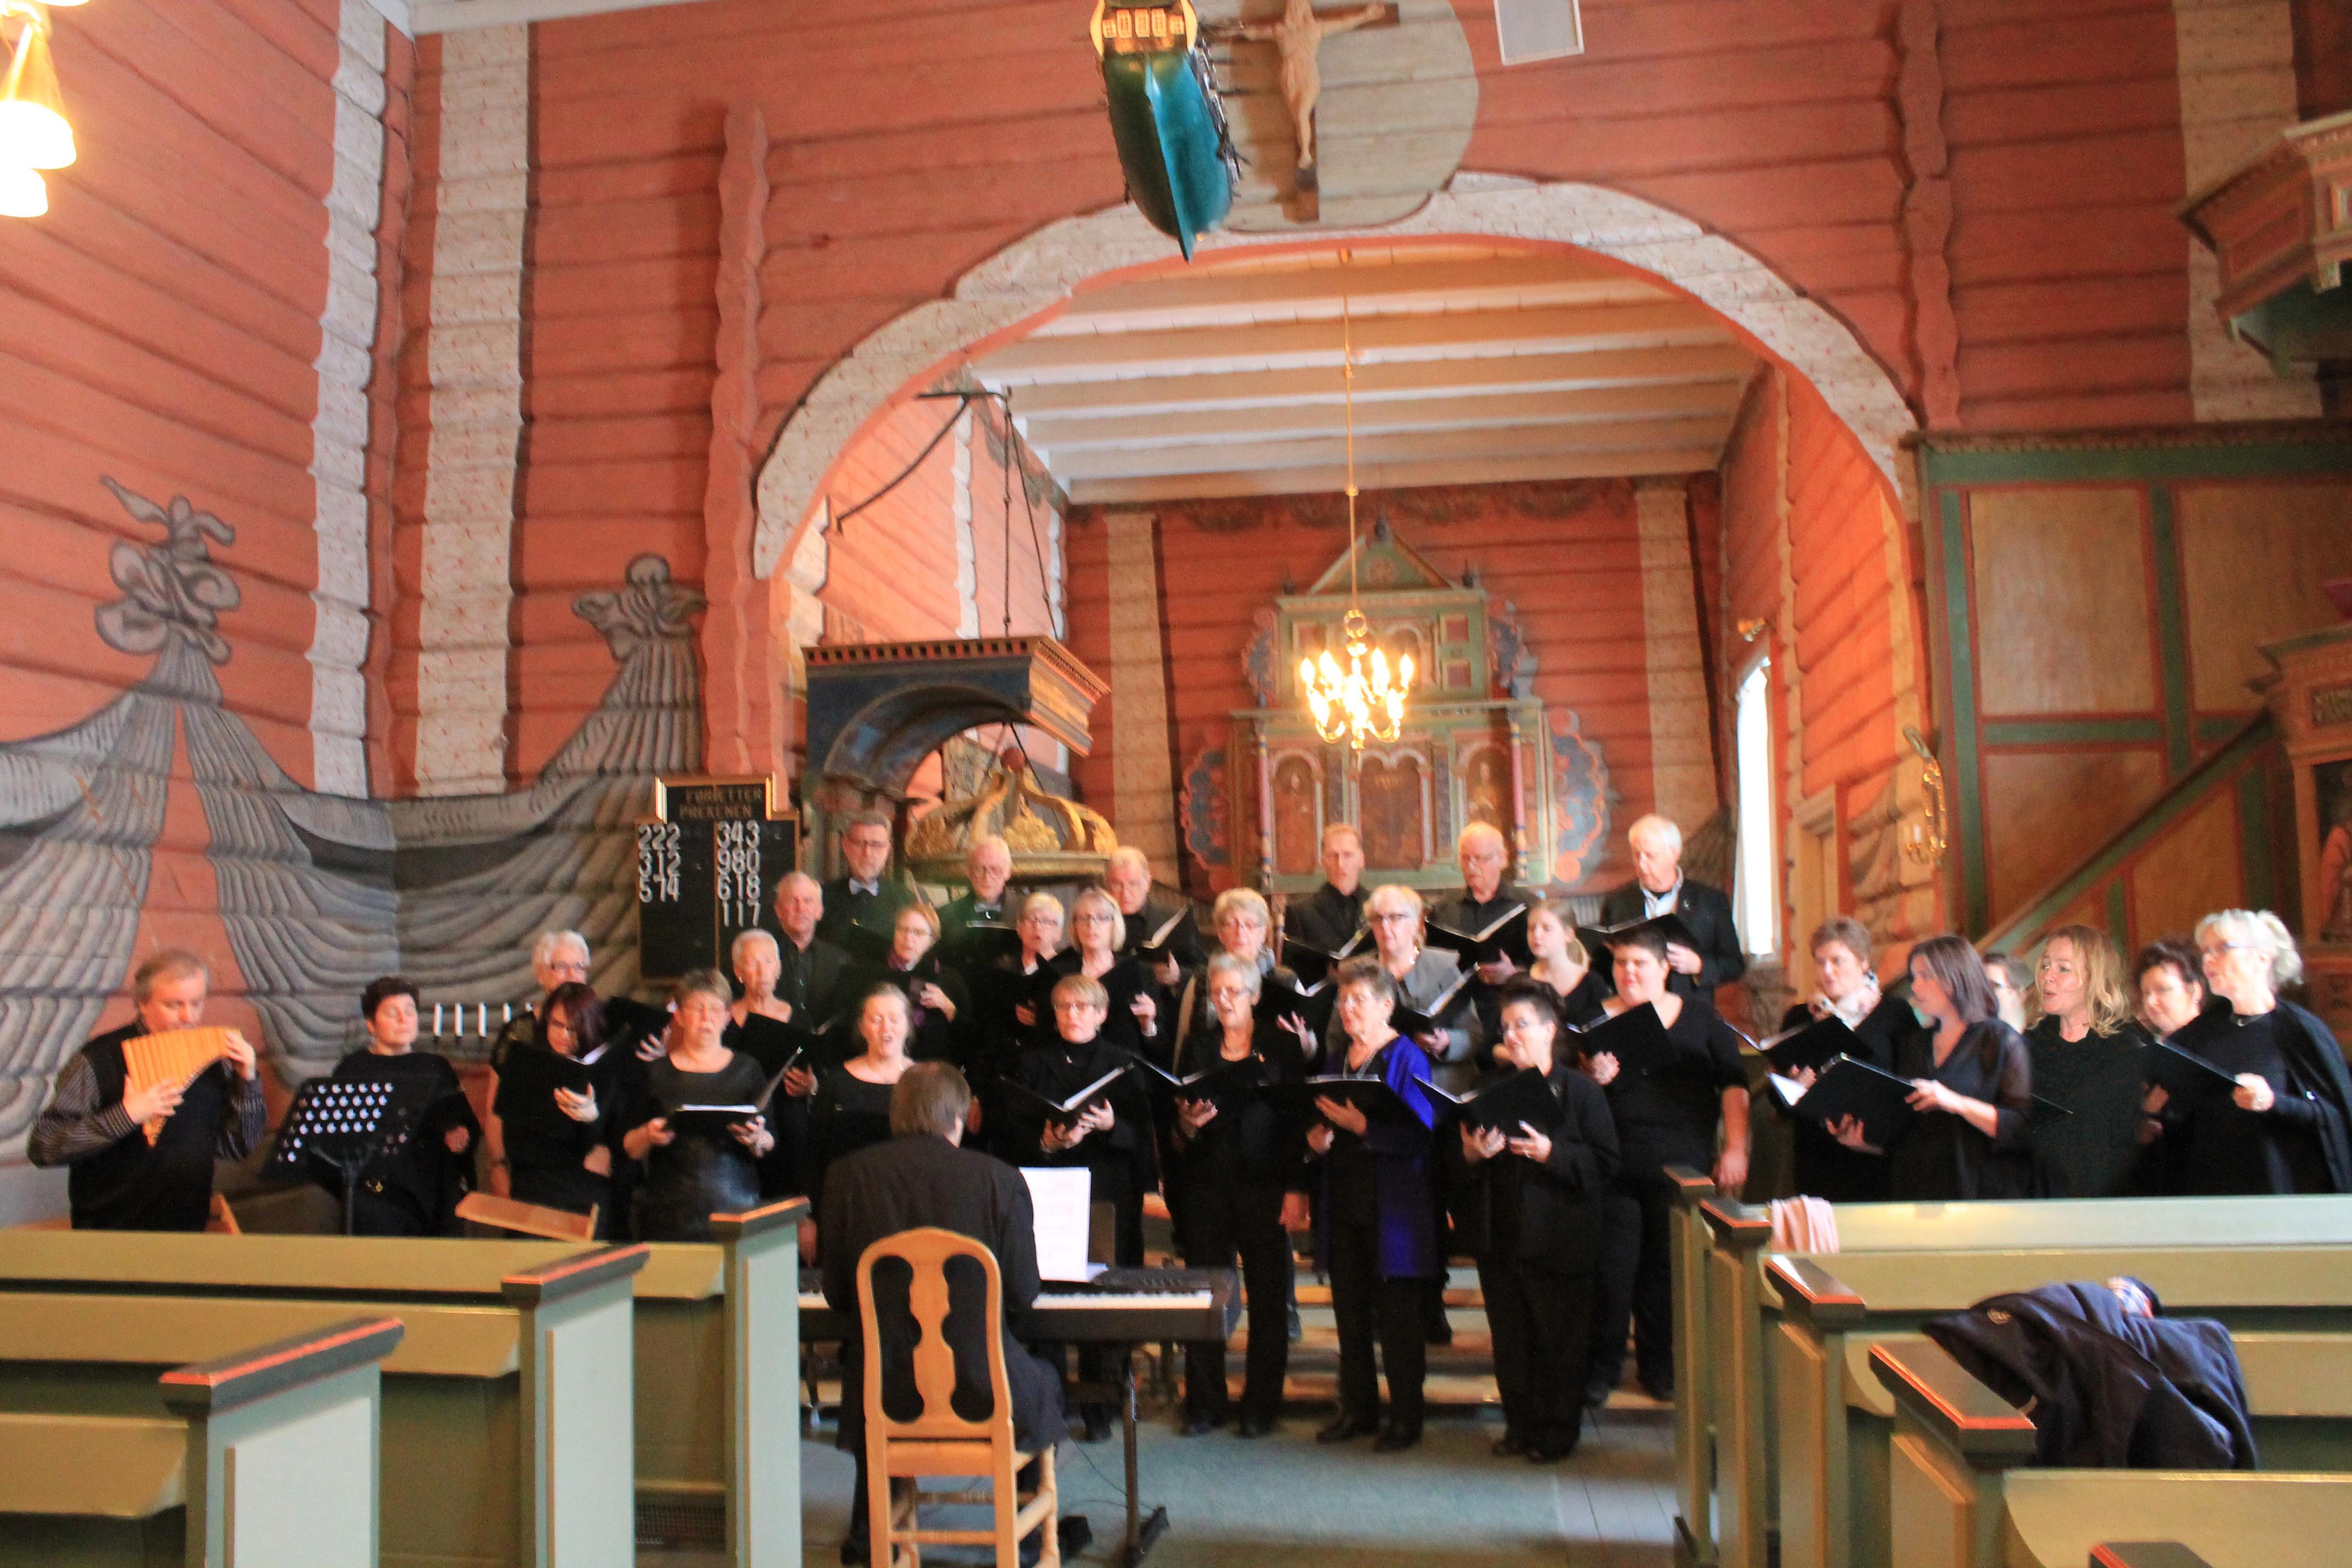 001 Konsert med Roar Engelberg Svarstad kirke 13.03.15 8981